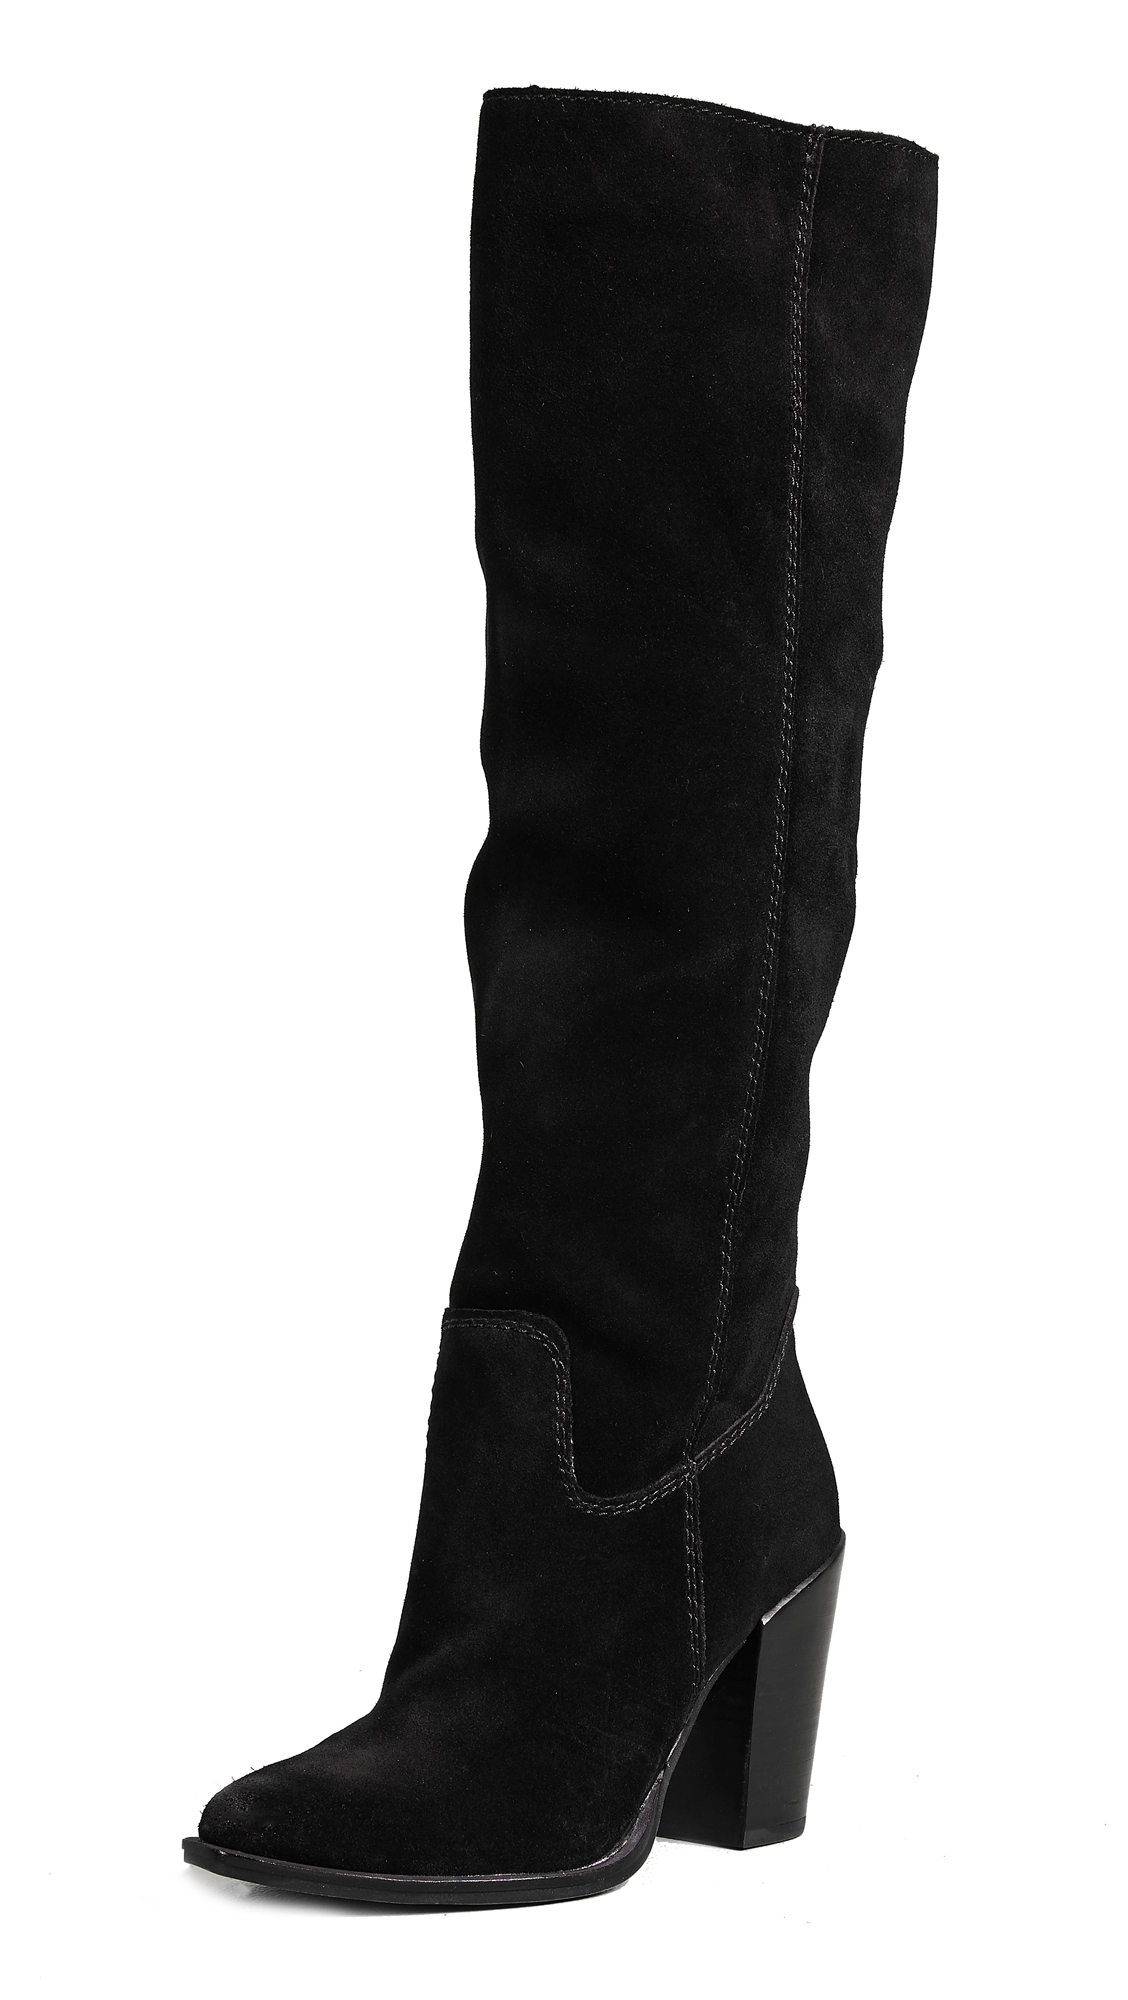 Dolce Vita Kylar Tall Boots - Black